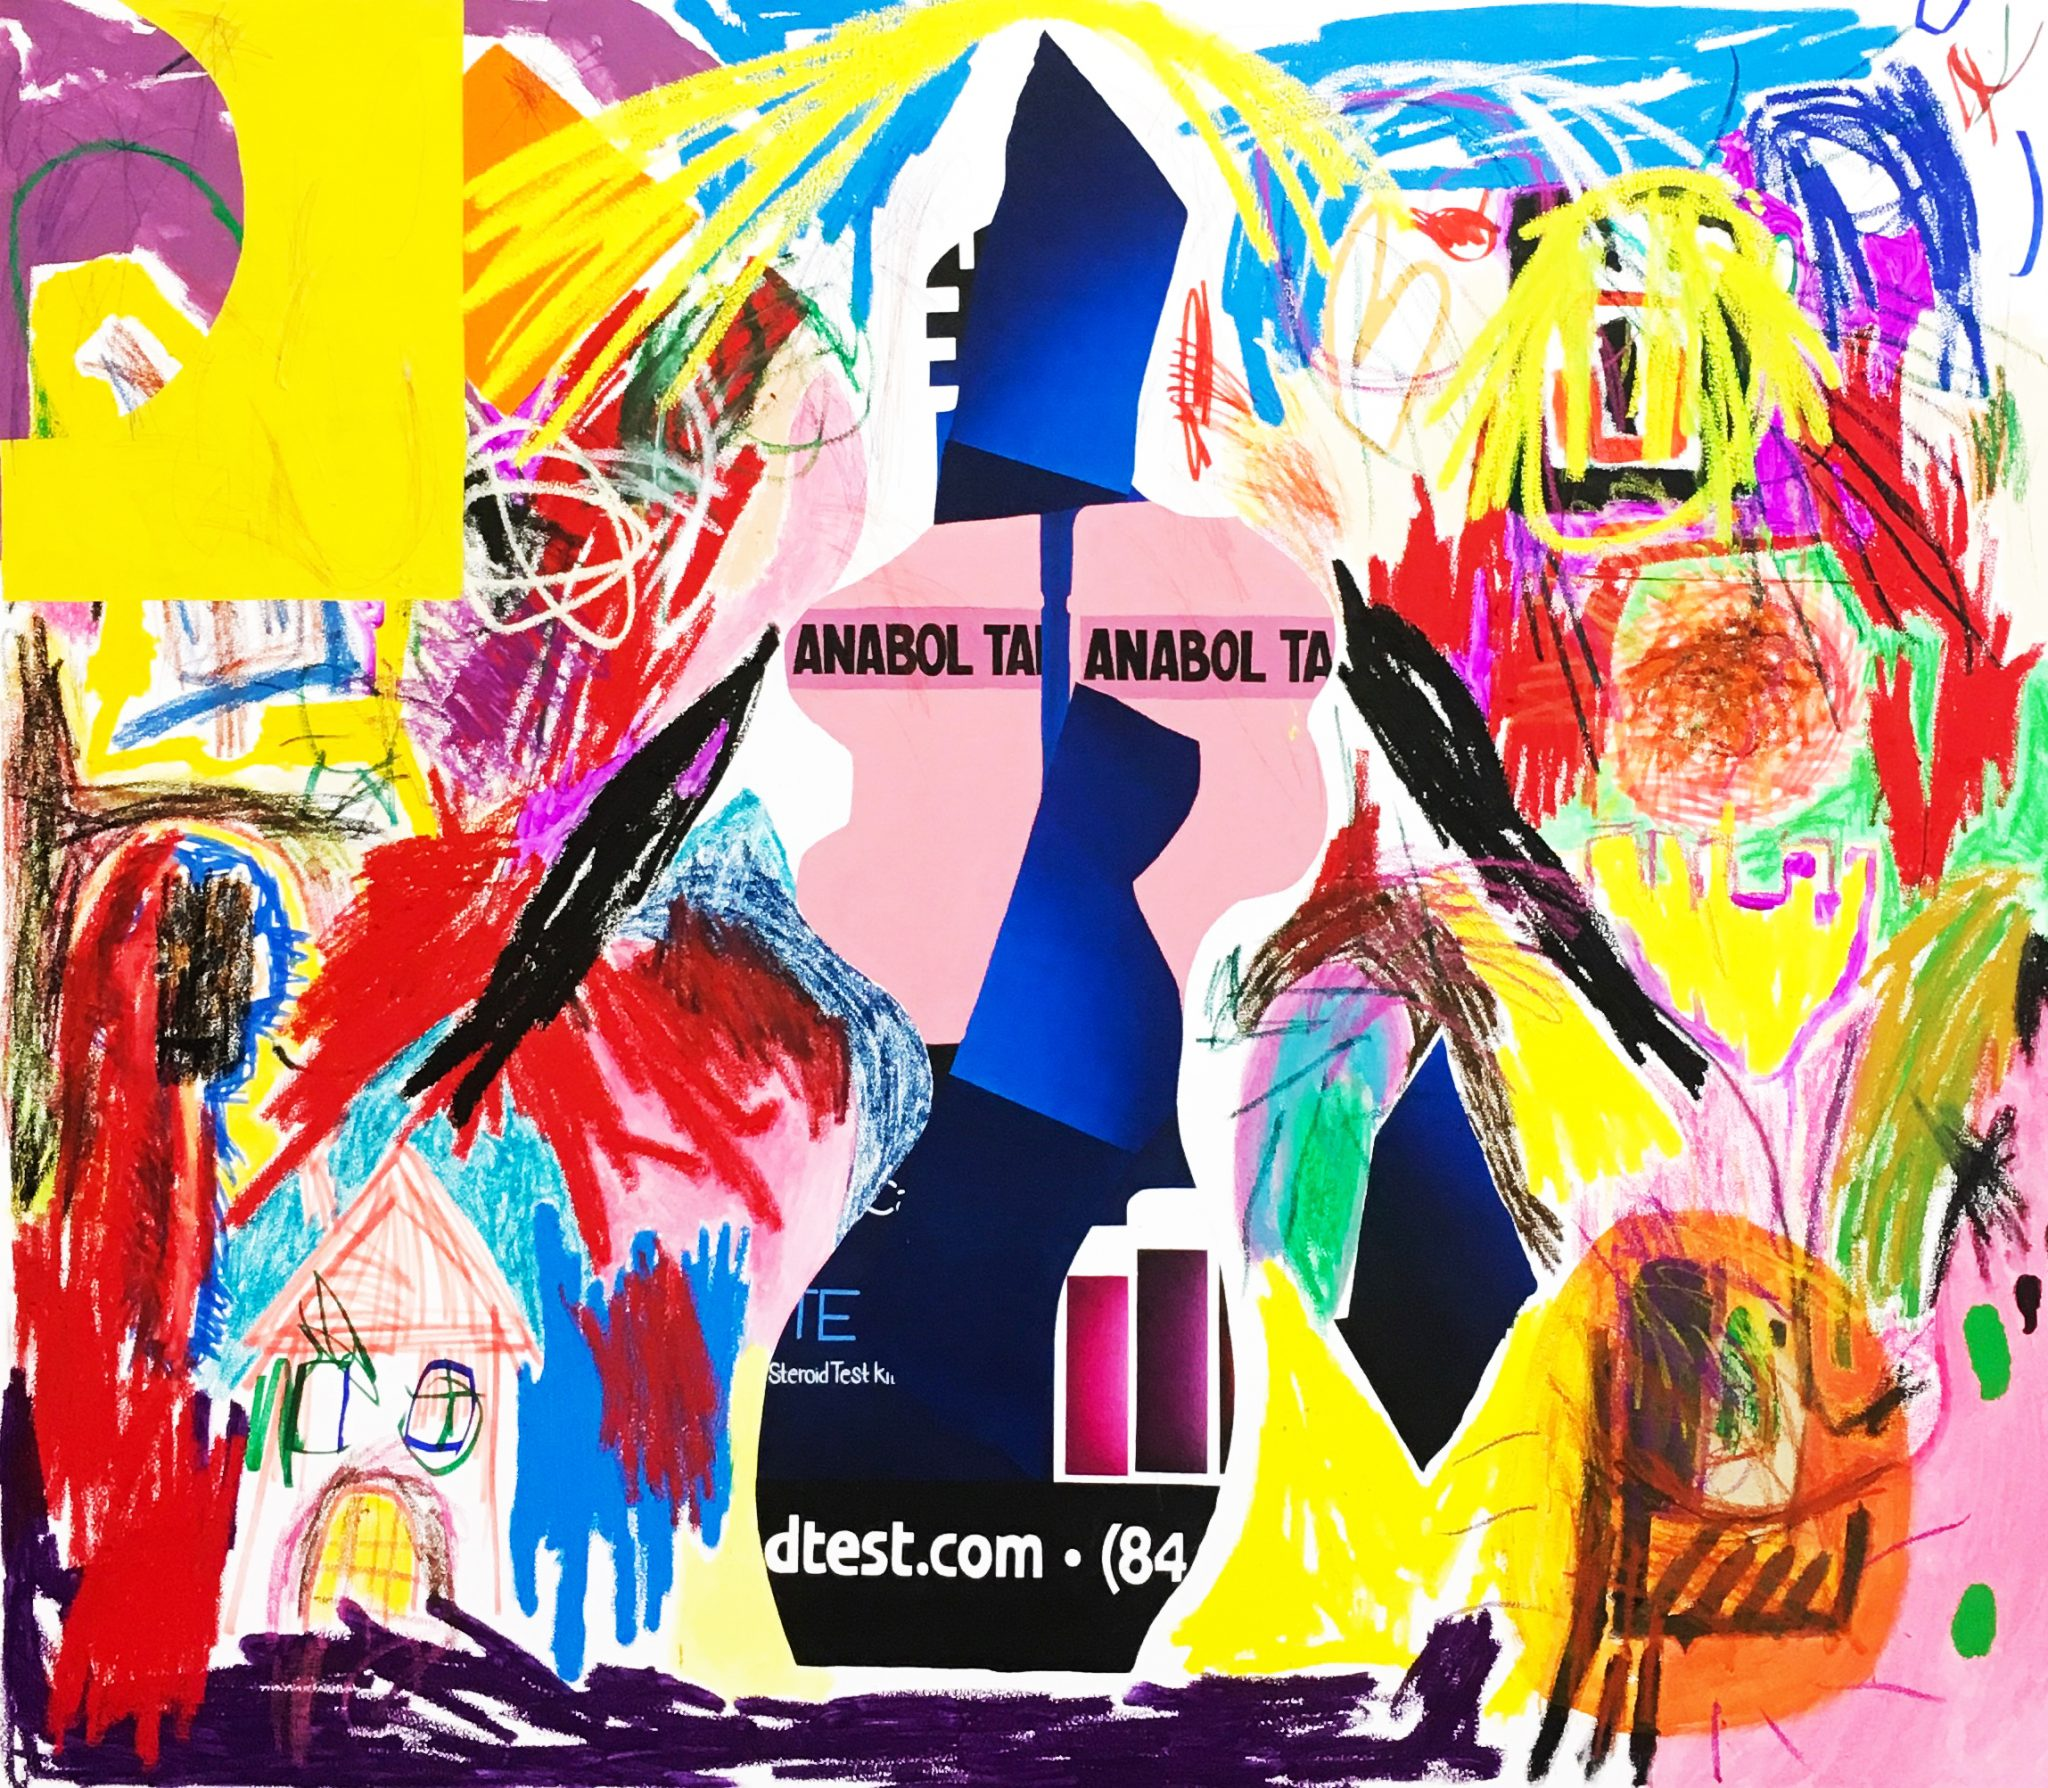 Jannis Varelas Anabole, 2017 oil, oilstick, acrylic, permanent marker, pastel, crayon, gesso on canvas 210 x 240 cm | 82 2/3 x 94 1/2 in